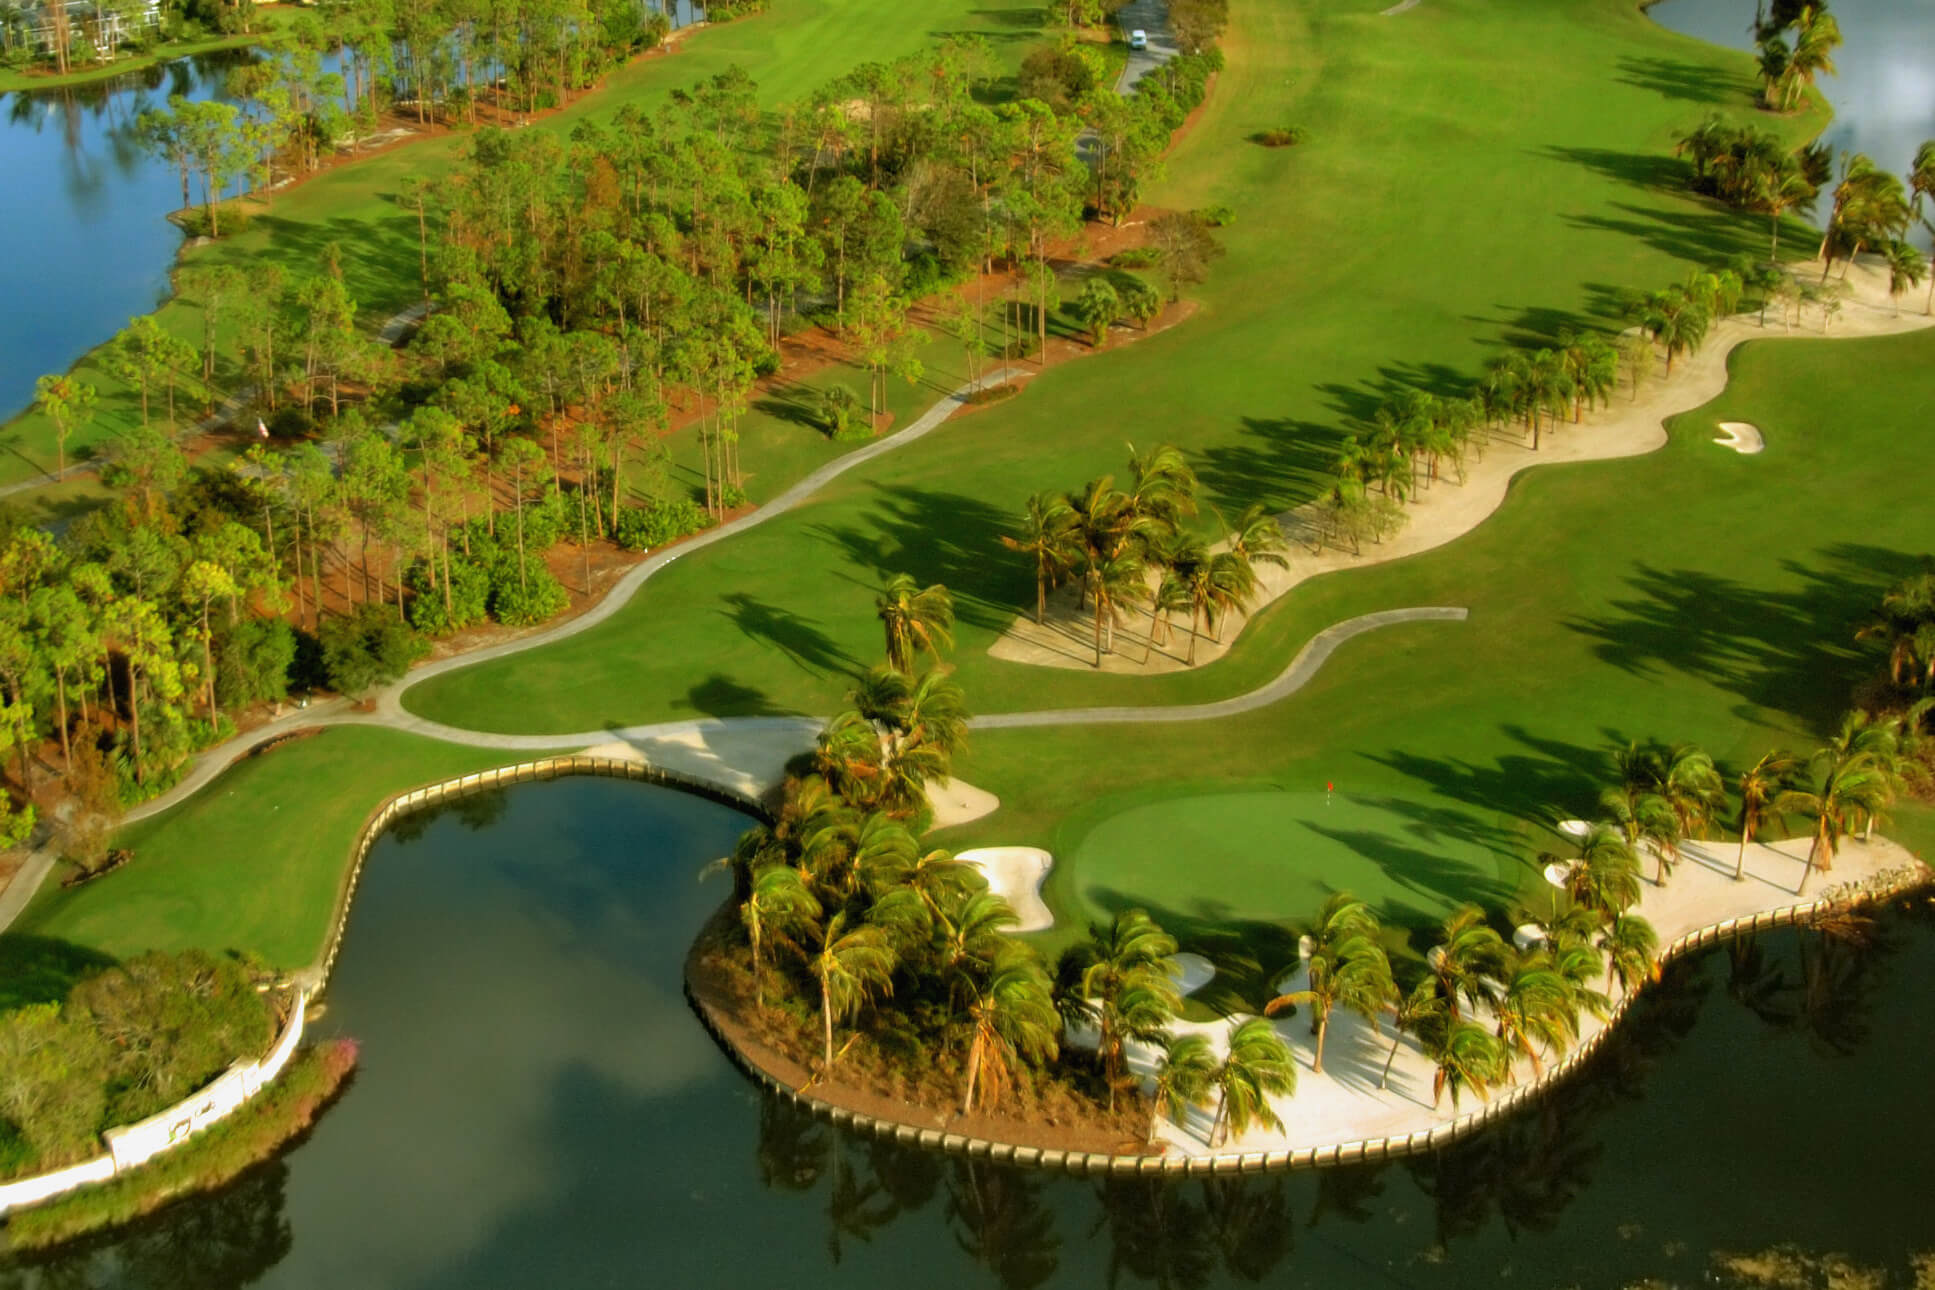 Florida Keys Drone Photography